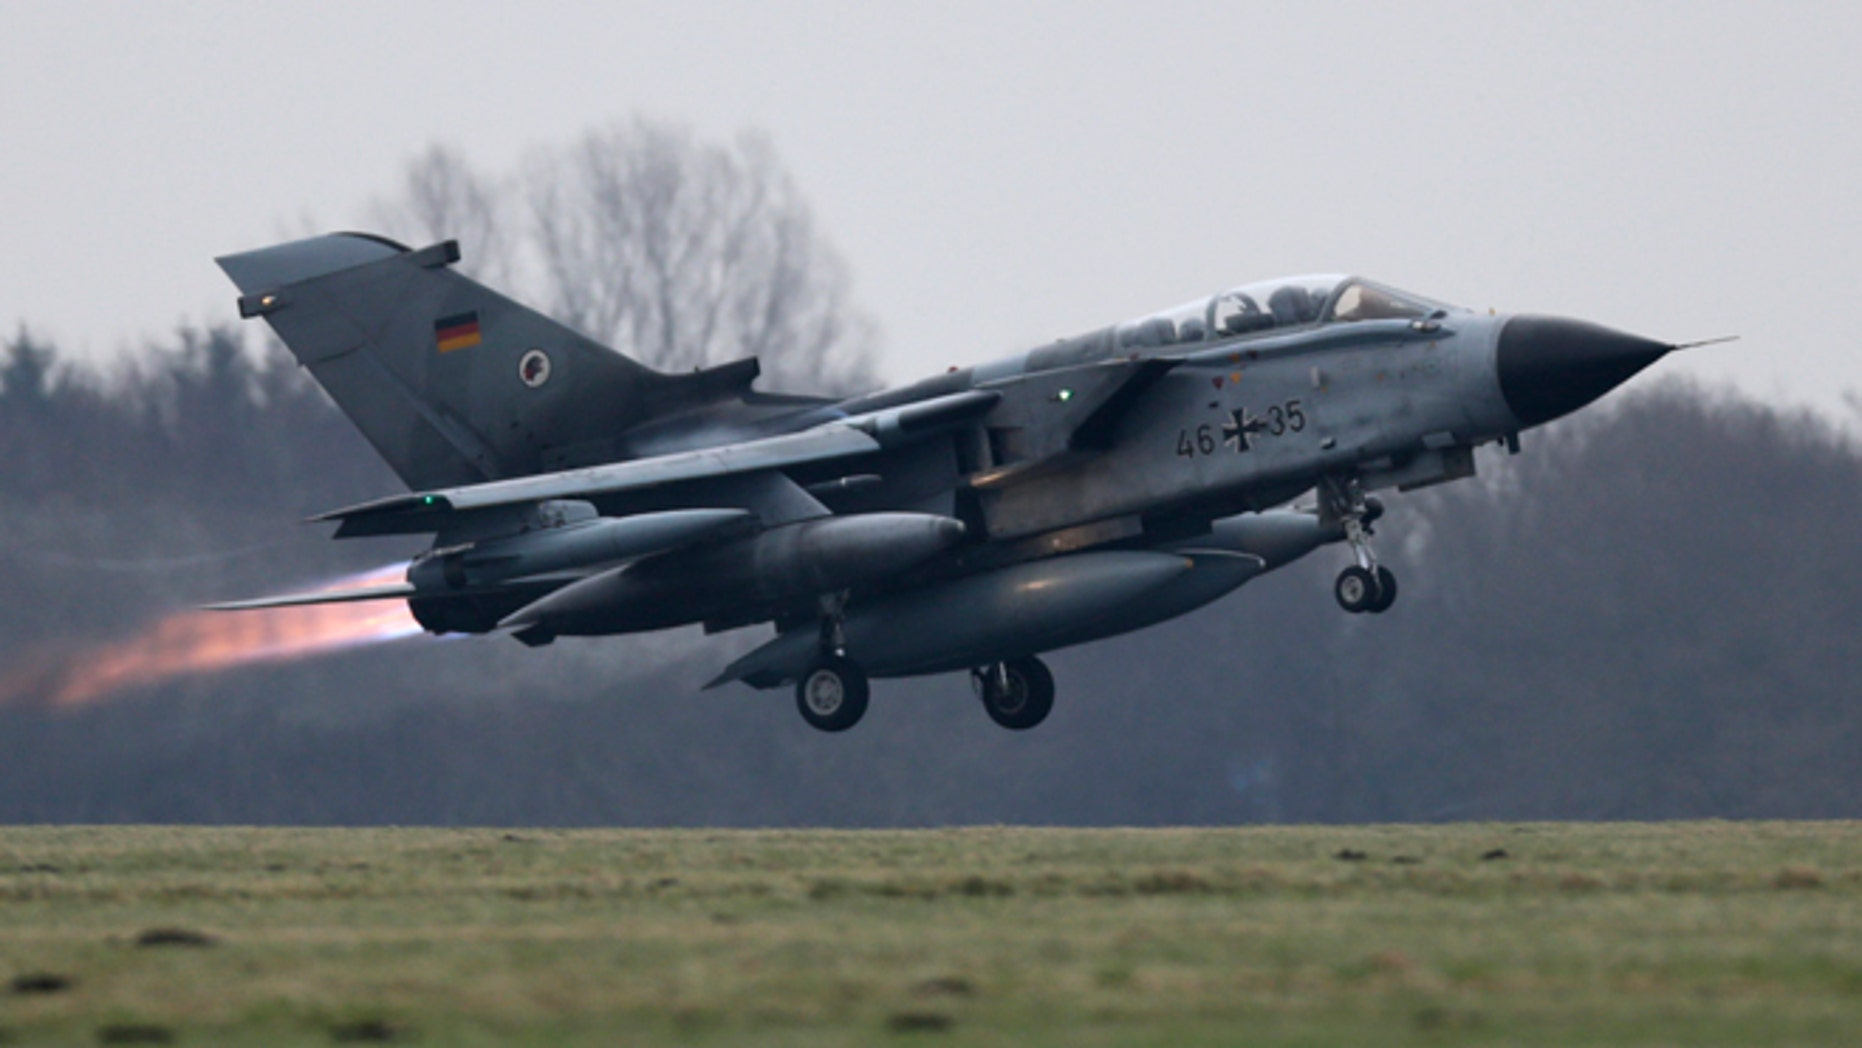 Dec. 10, 2015: A German air force Tornado jet takes off from the German army Bundeswehr airbase in Jagel, northern Germany.